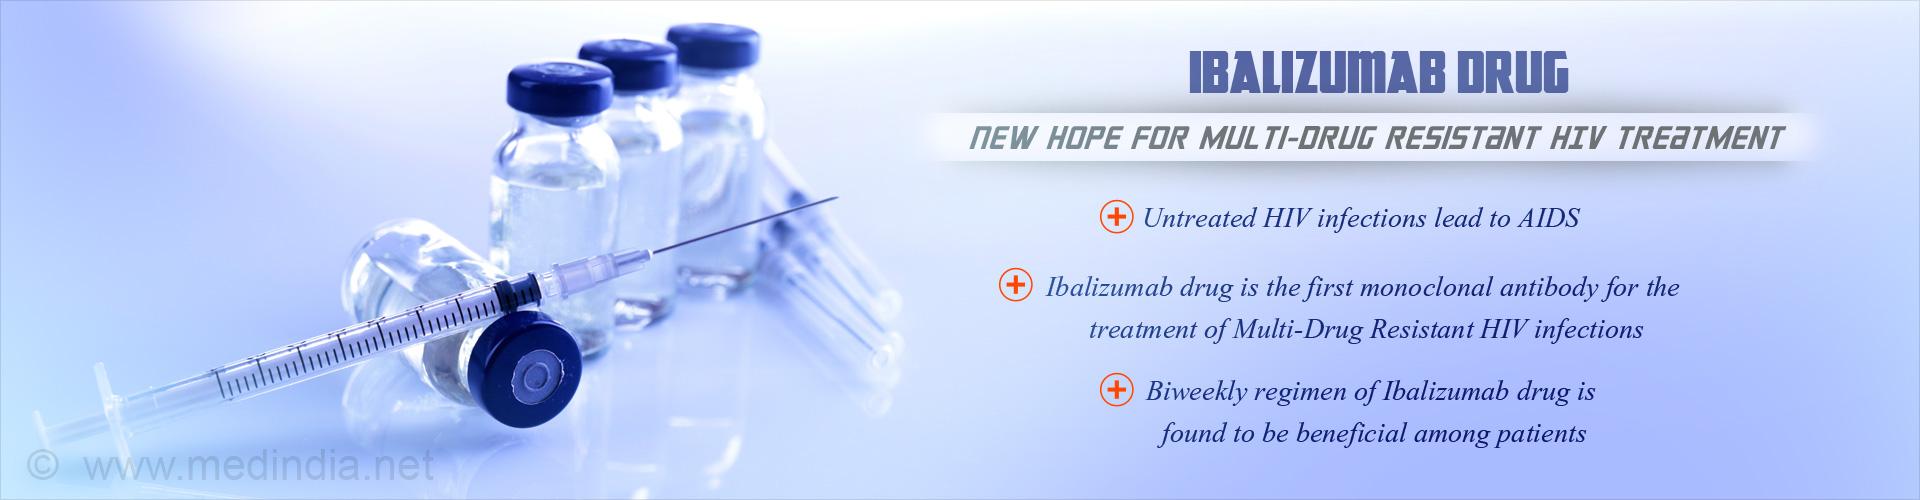 Ibalizumab Drug - First Monoclonal Antibody for Multi-Drug Resistant HIV Treatment